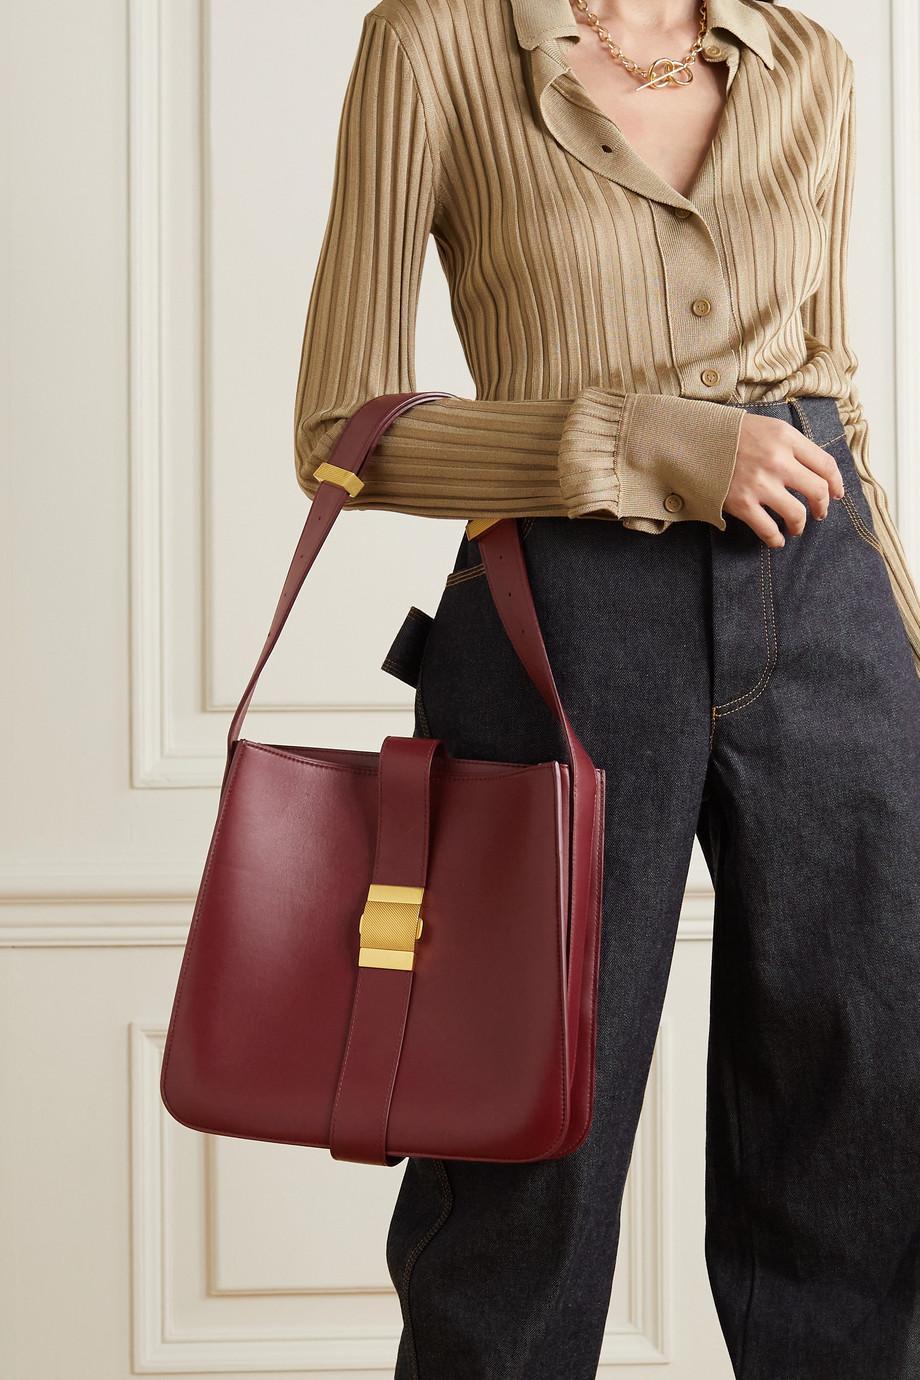 Bottega Veneta Marie mittelgroße Schultertasche aus Leder